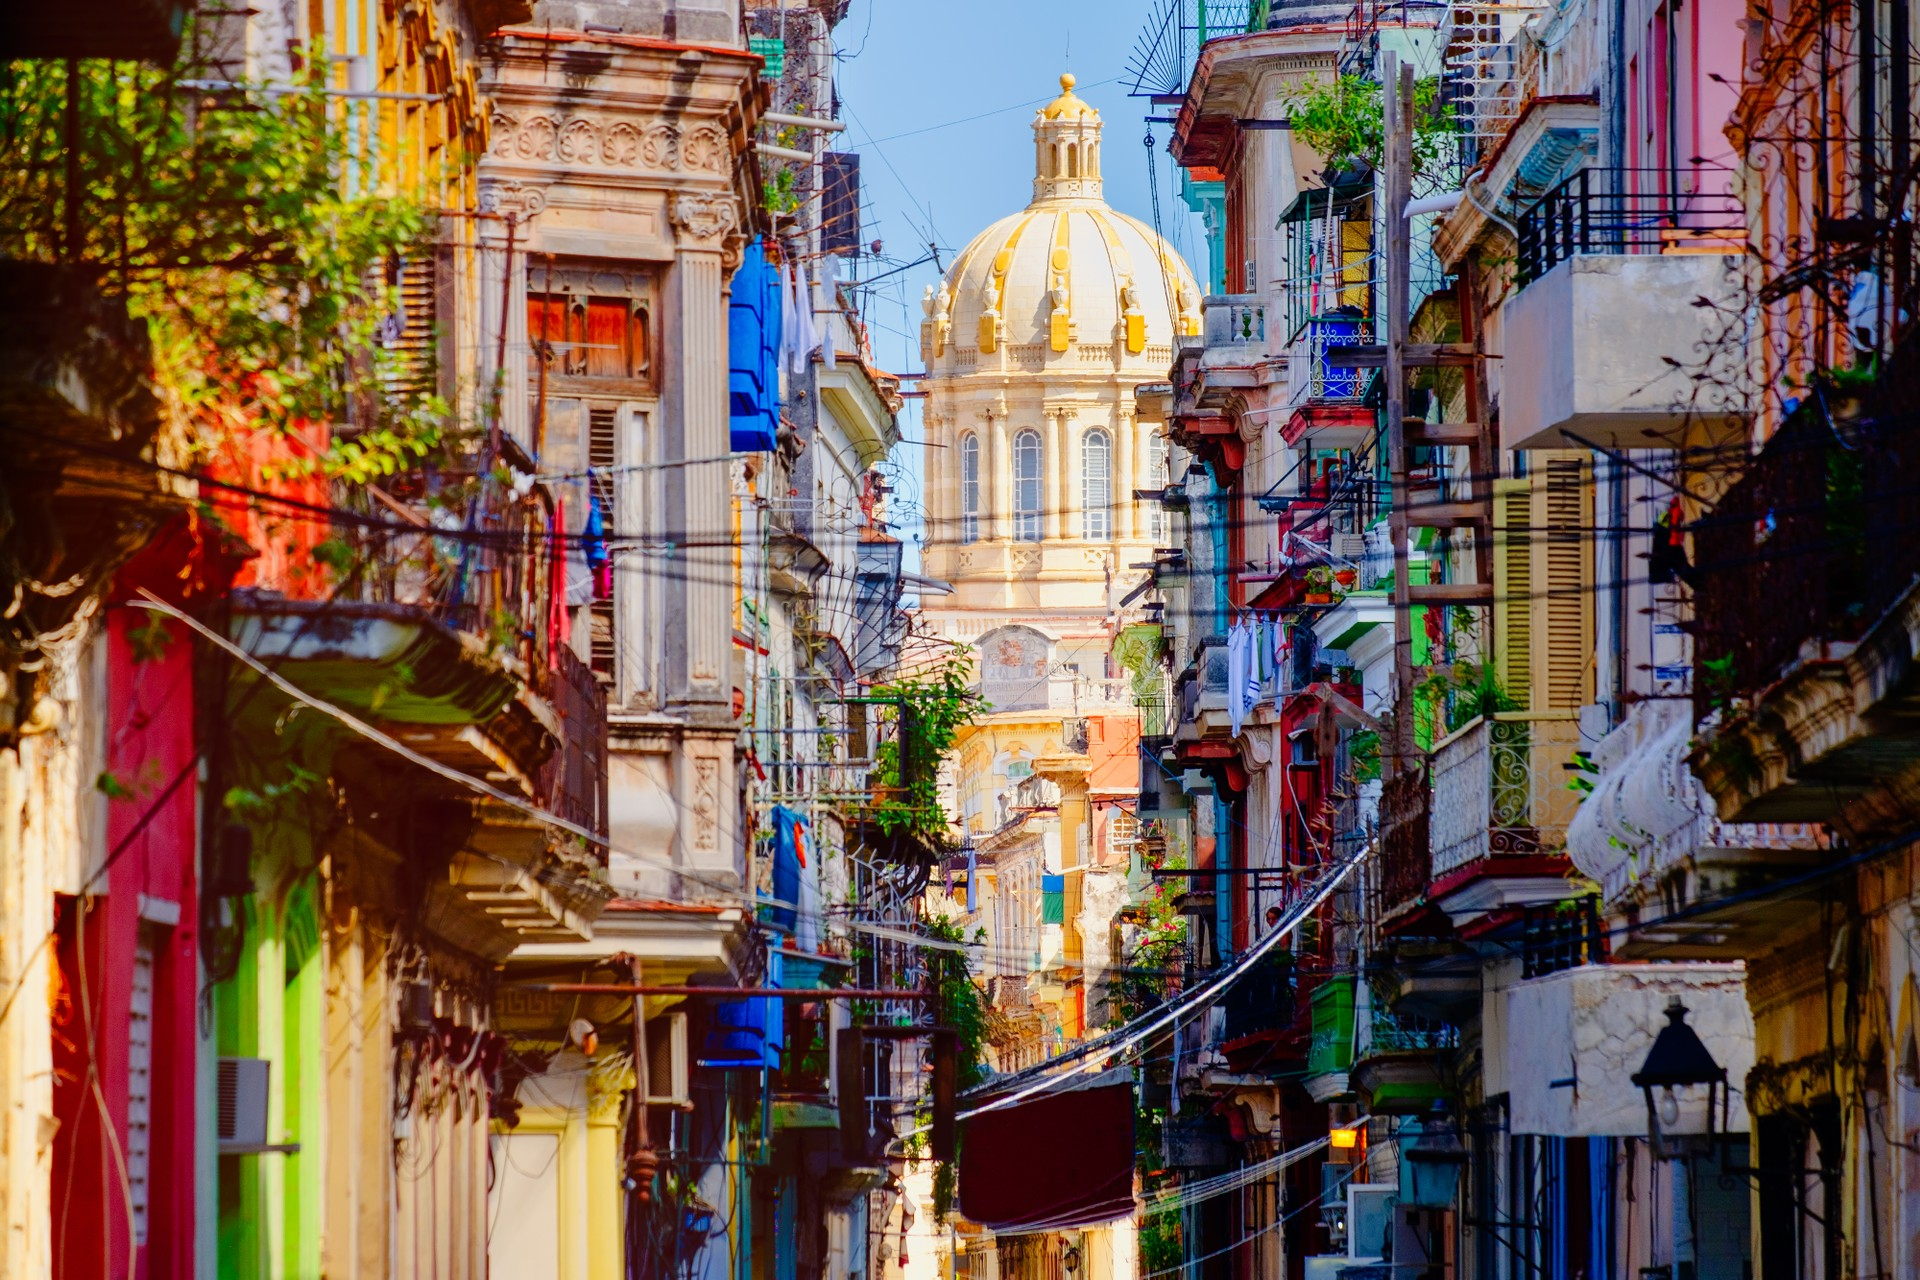 The cityscape of Havana, Cuba